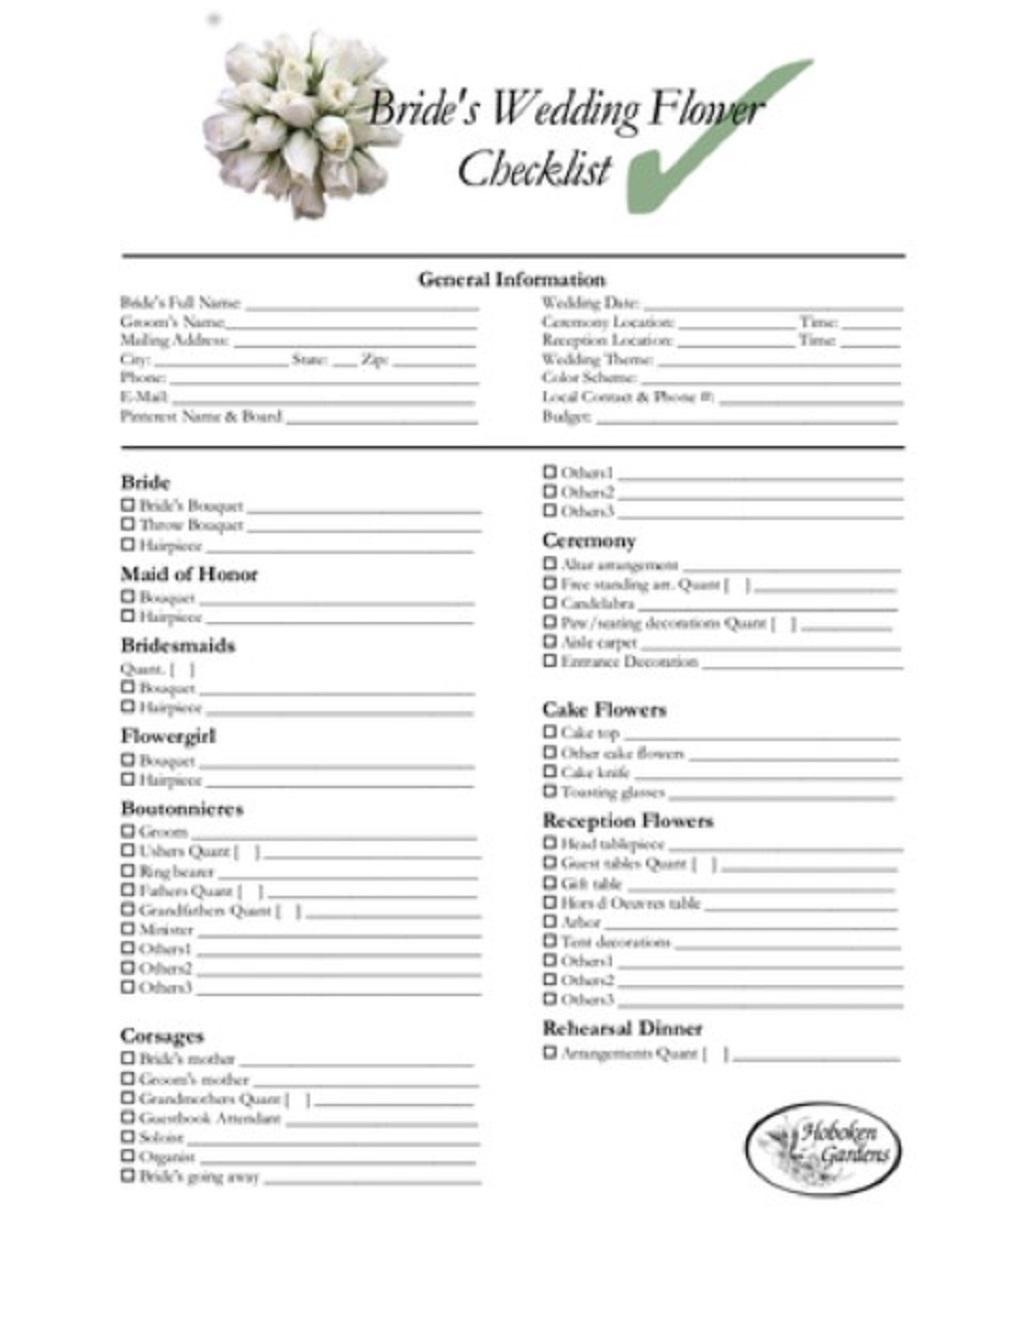 Bride Wedding Flower Checklist Template Example Sample